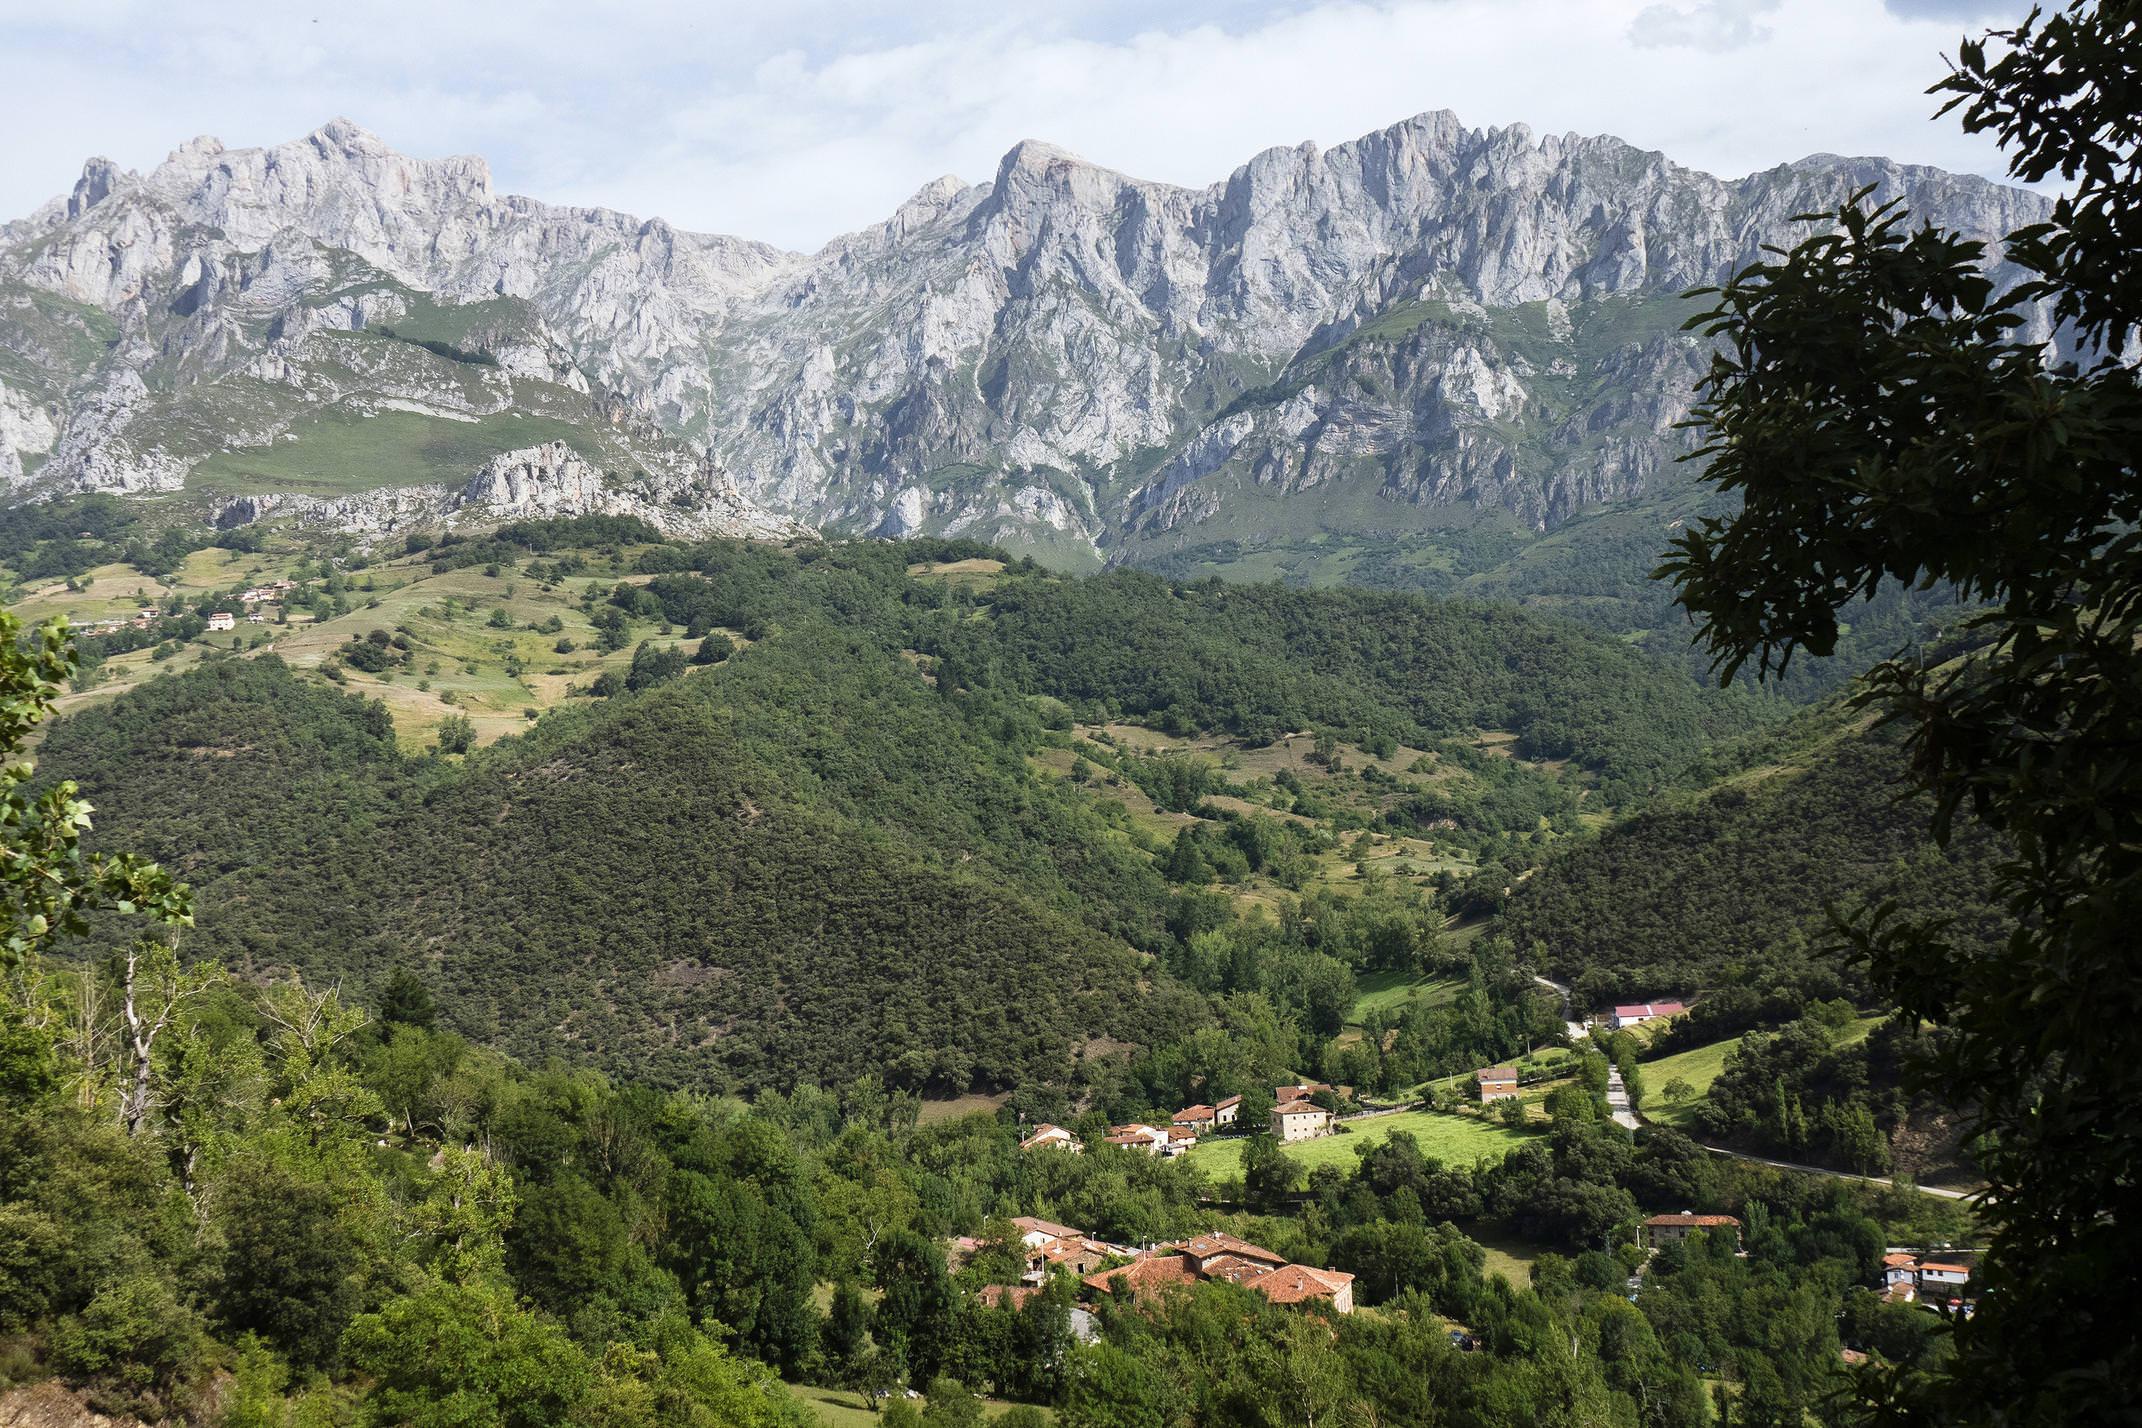 Spain picos de europa liebana baro san pelayo c diego pura